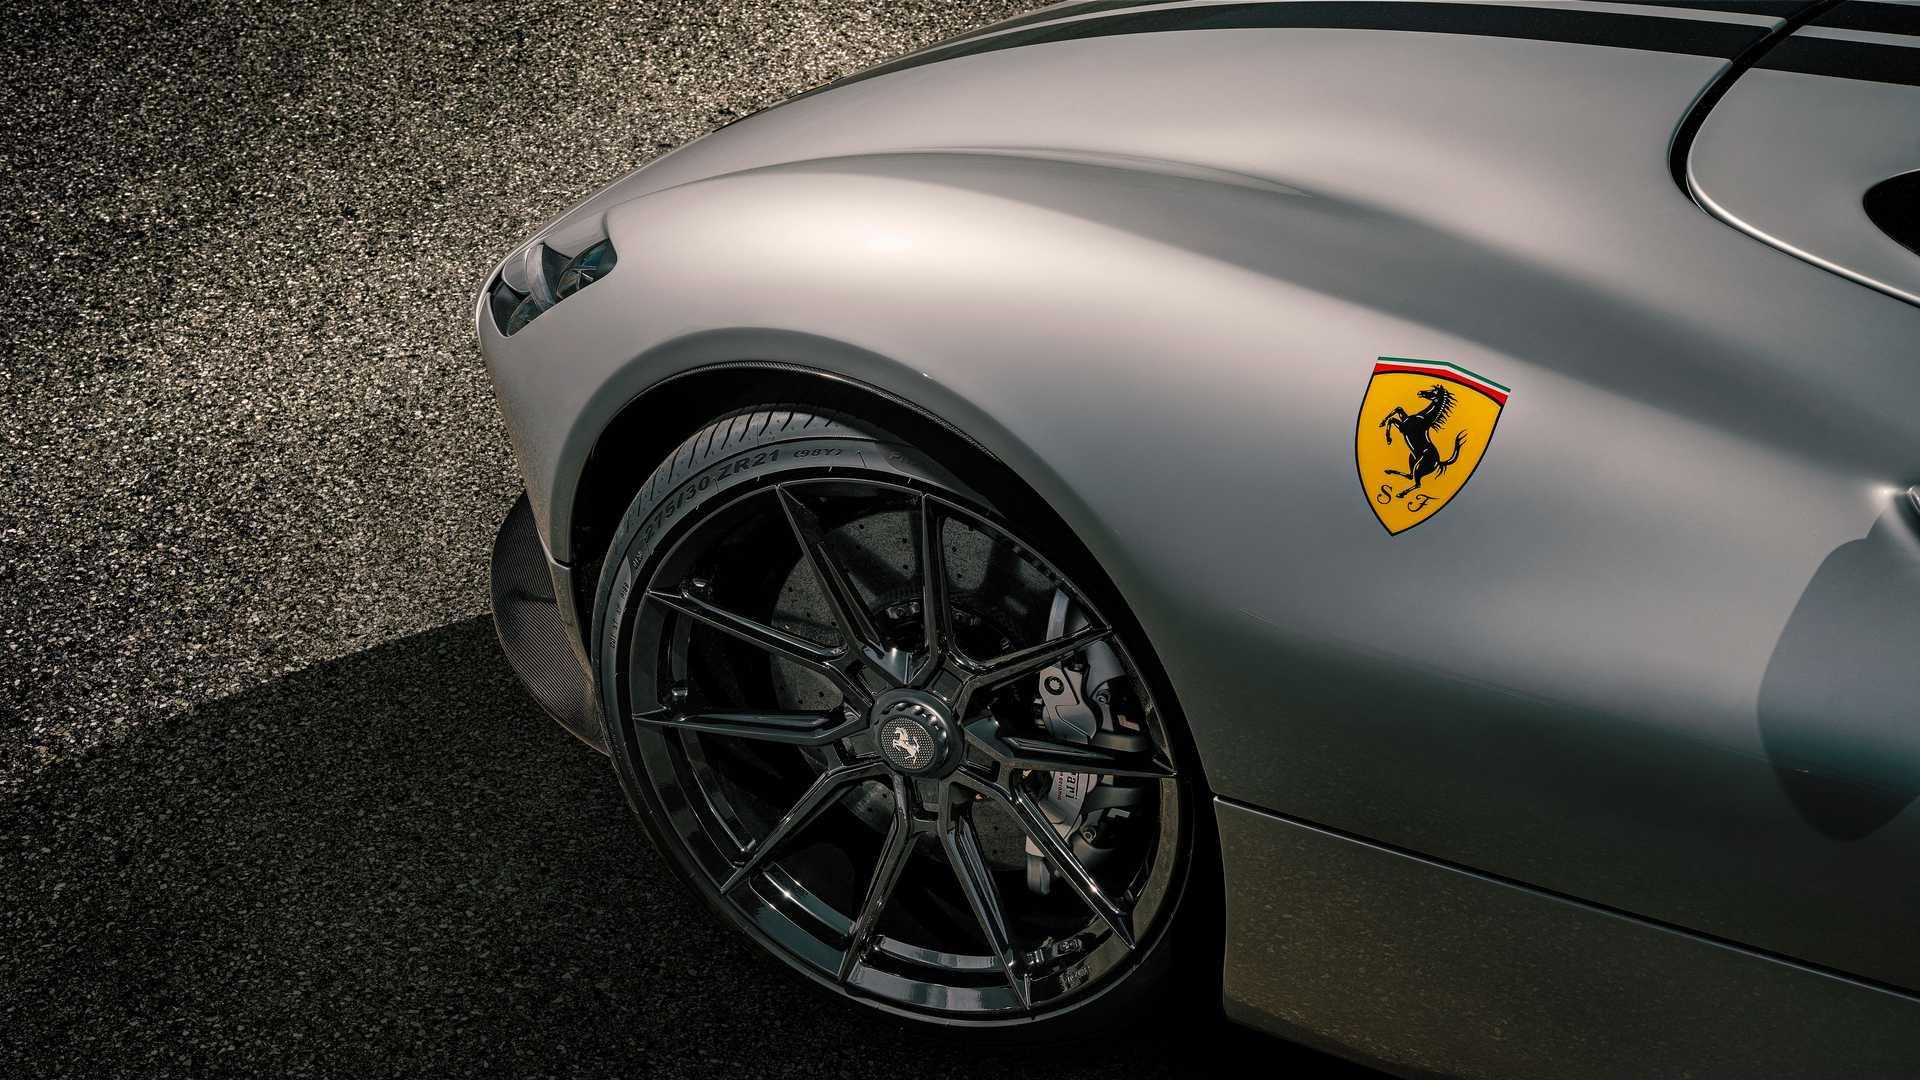 Ferrari_Monza_SP1_tuning_by_Novitec_0006